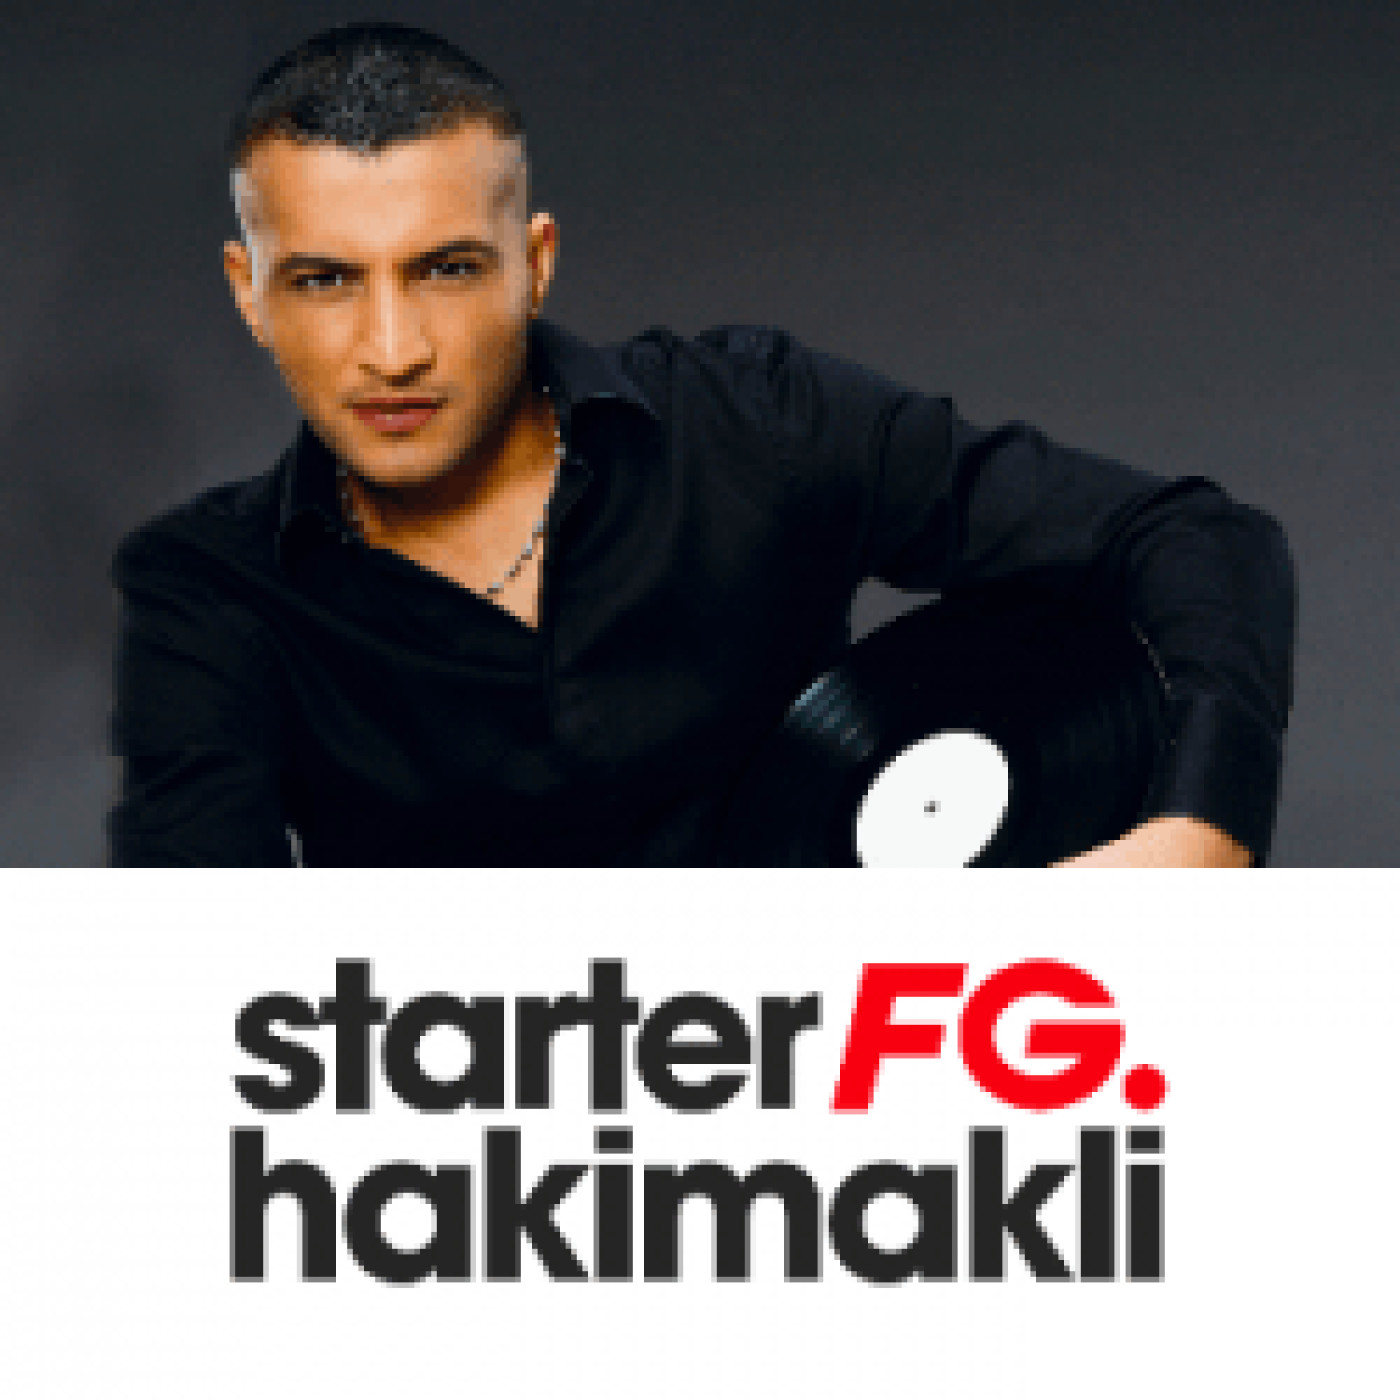 STARTER FG BY HAKIMAKLI LUNDI 18 JANVIER 2021